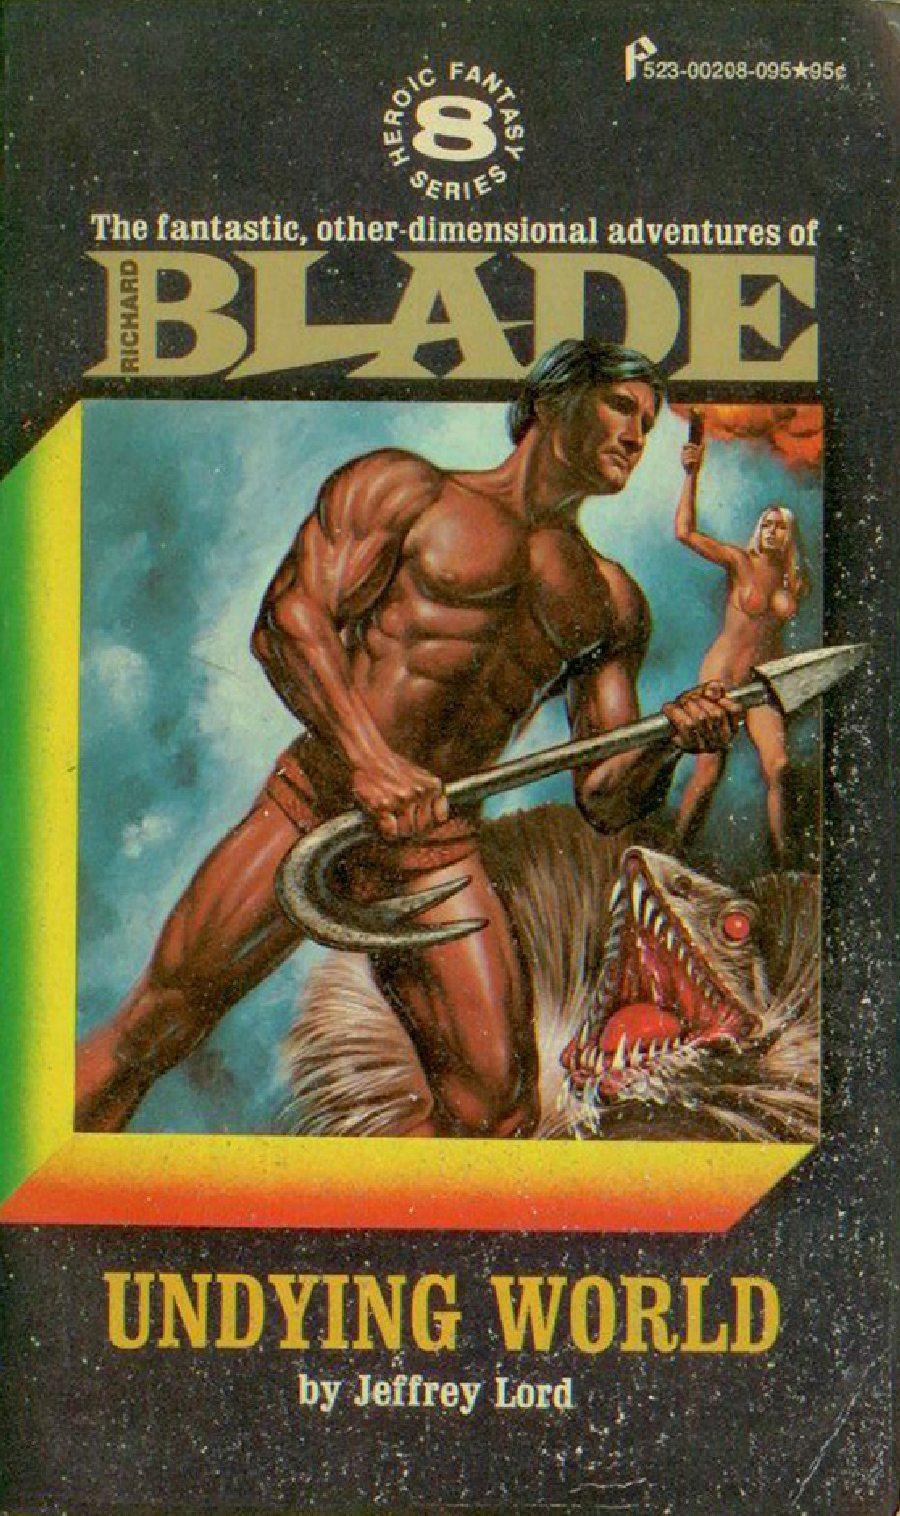 Dick Blade. He puts the 'f' in ... er ... phallic?